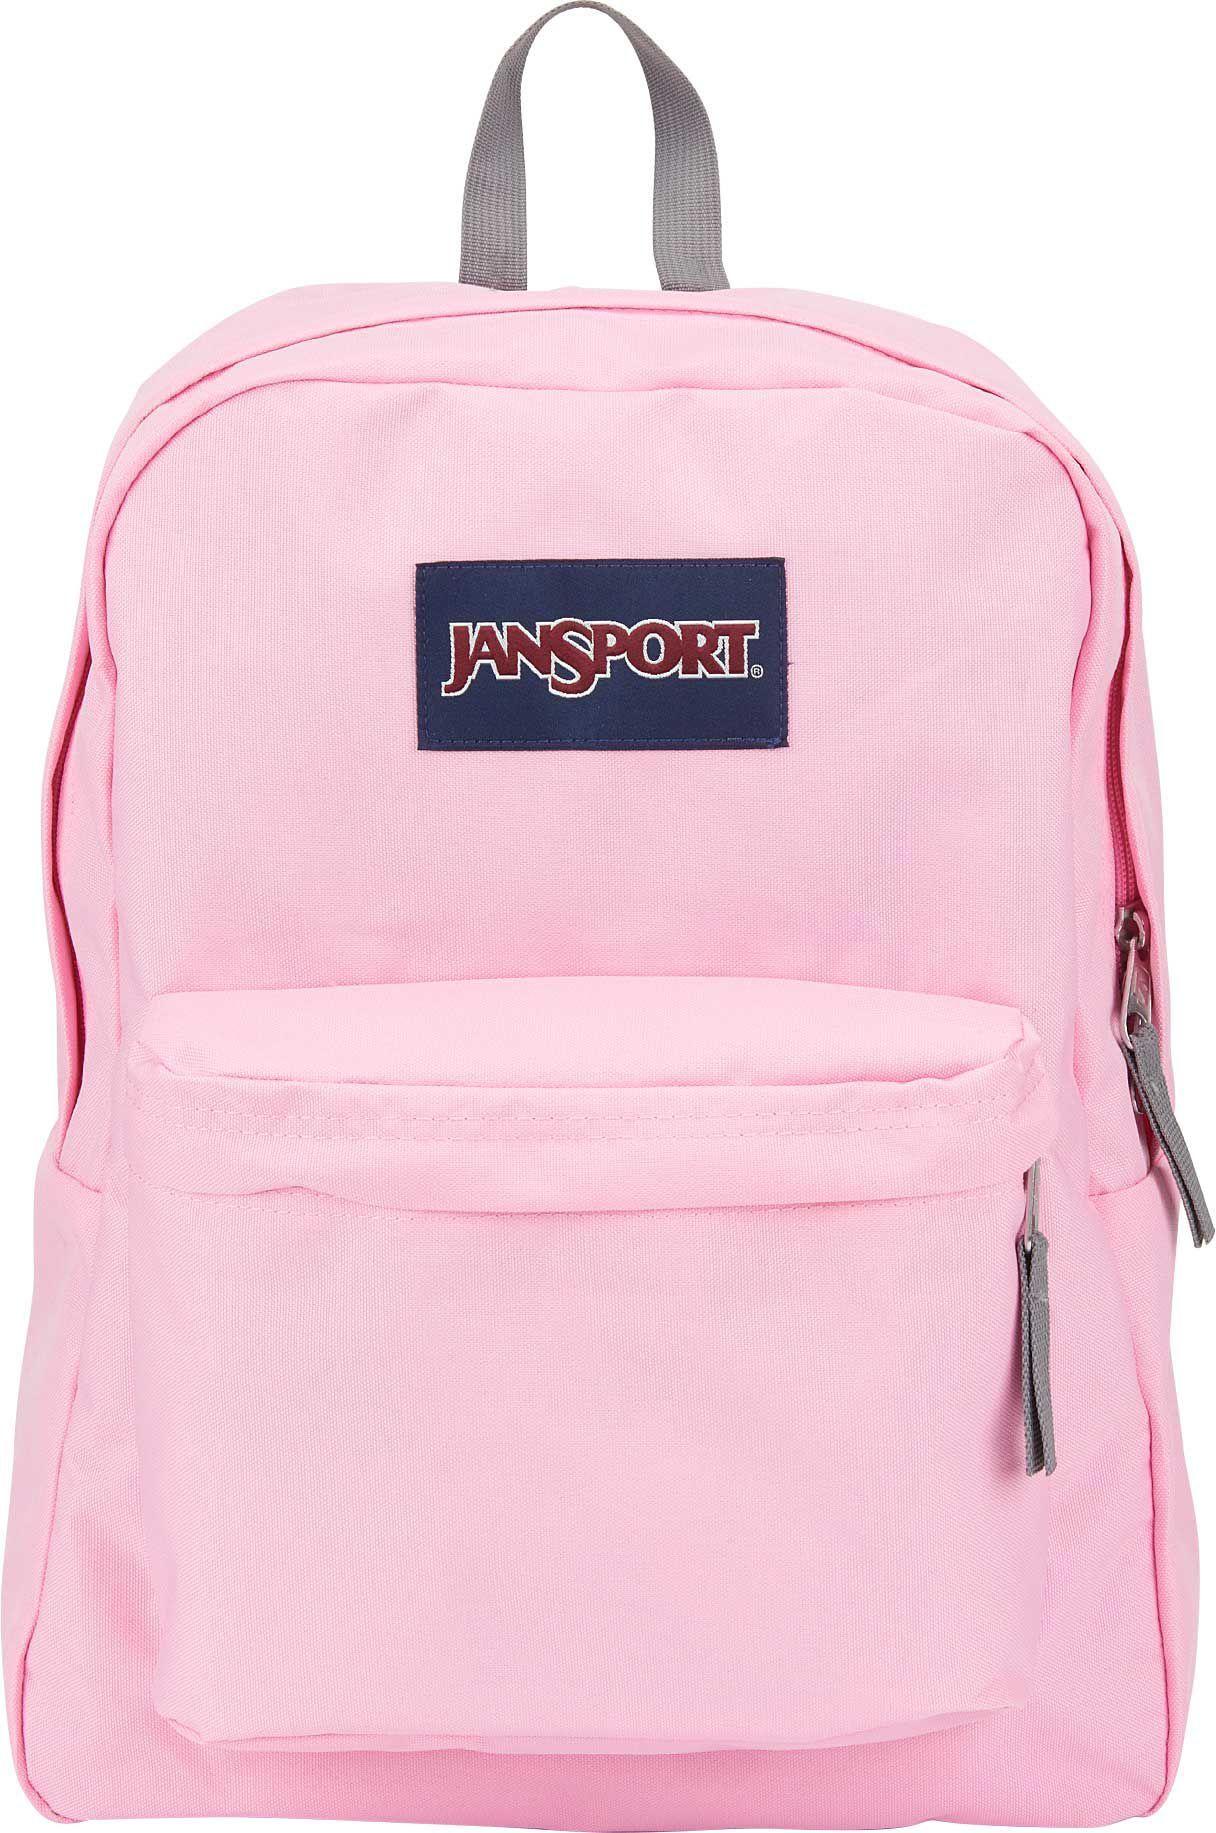 35622914d JanSport Superbreak Backpack, Pink Mochila Jansport, Mochilas, Bolsas  Mochila, Engranajes De Gimnasio